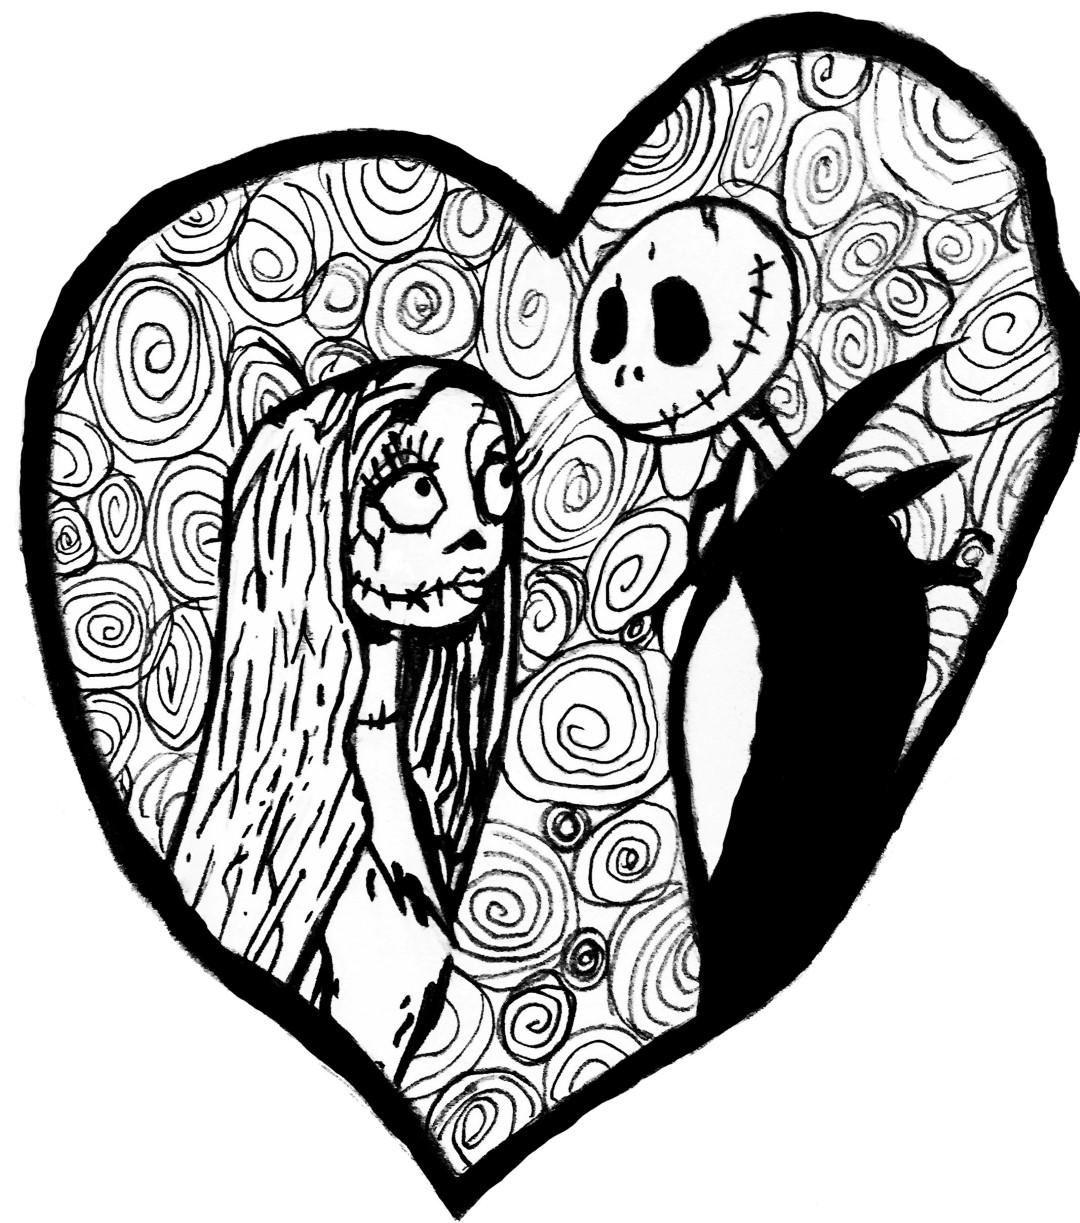 Jack Skelington Heart Coloring Page